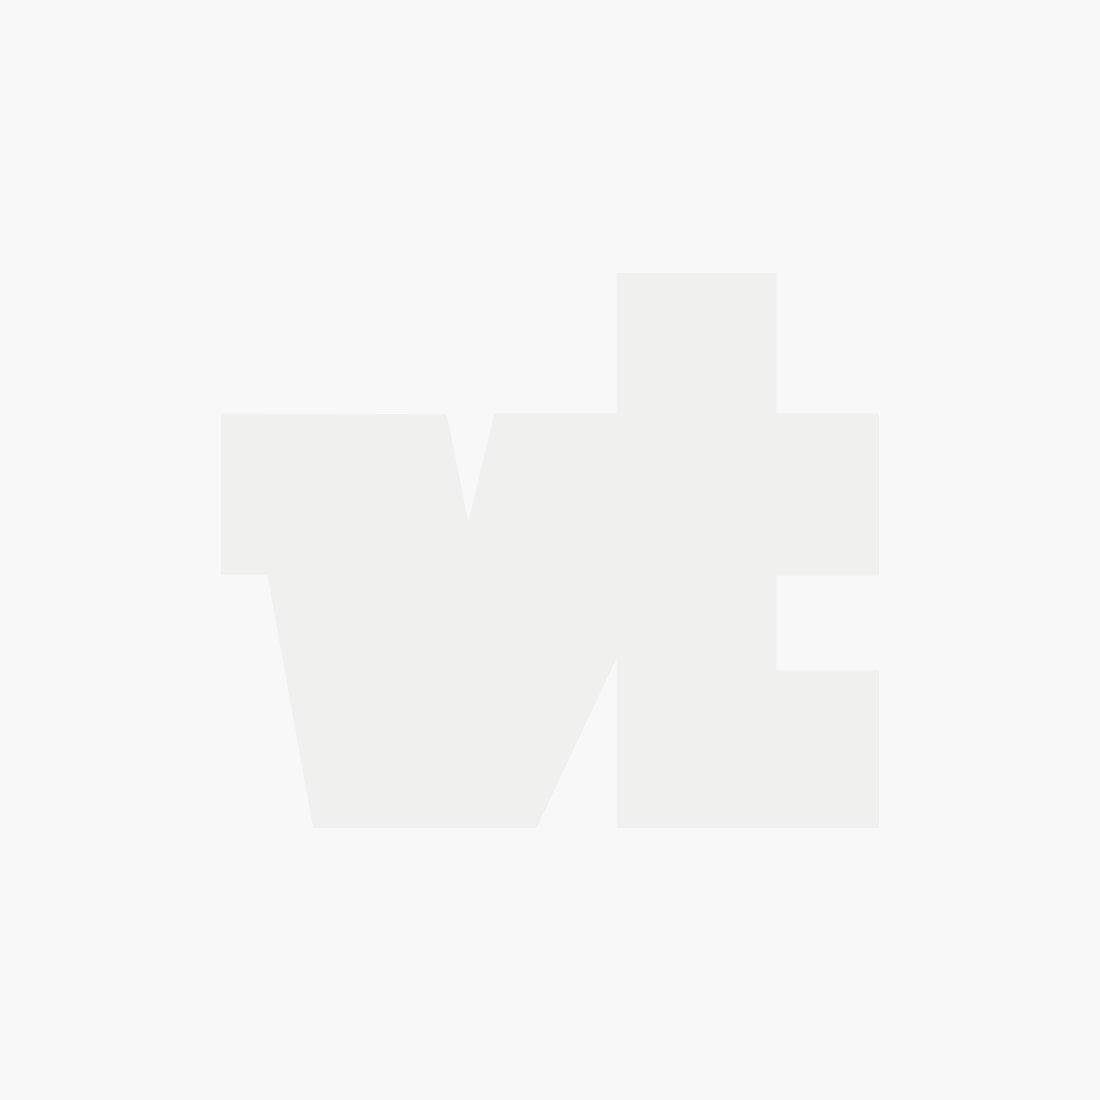 G-star hdd sw l\s whitebait